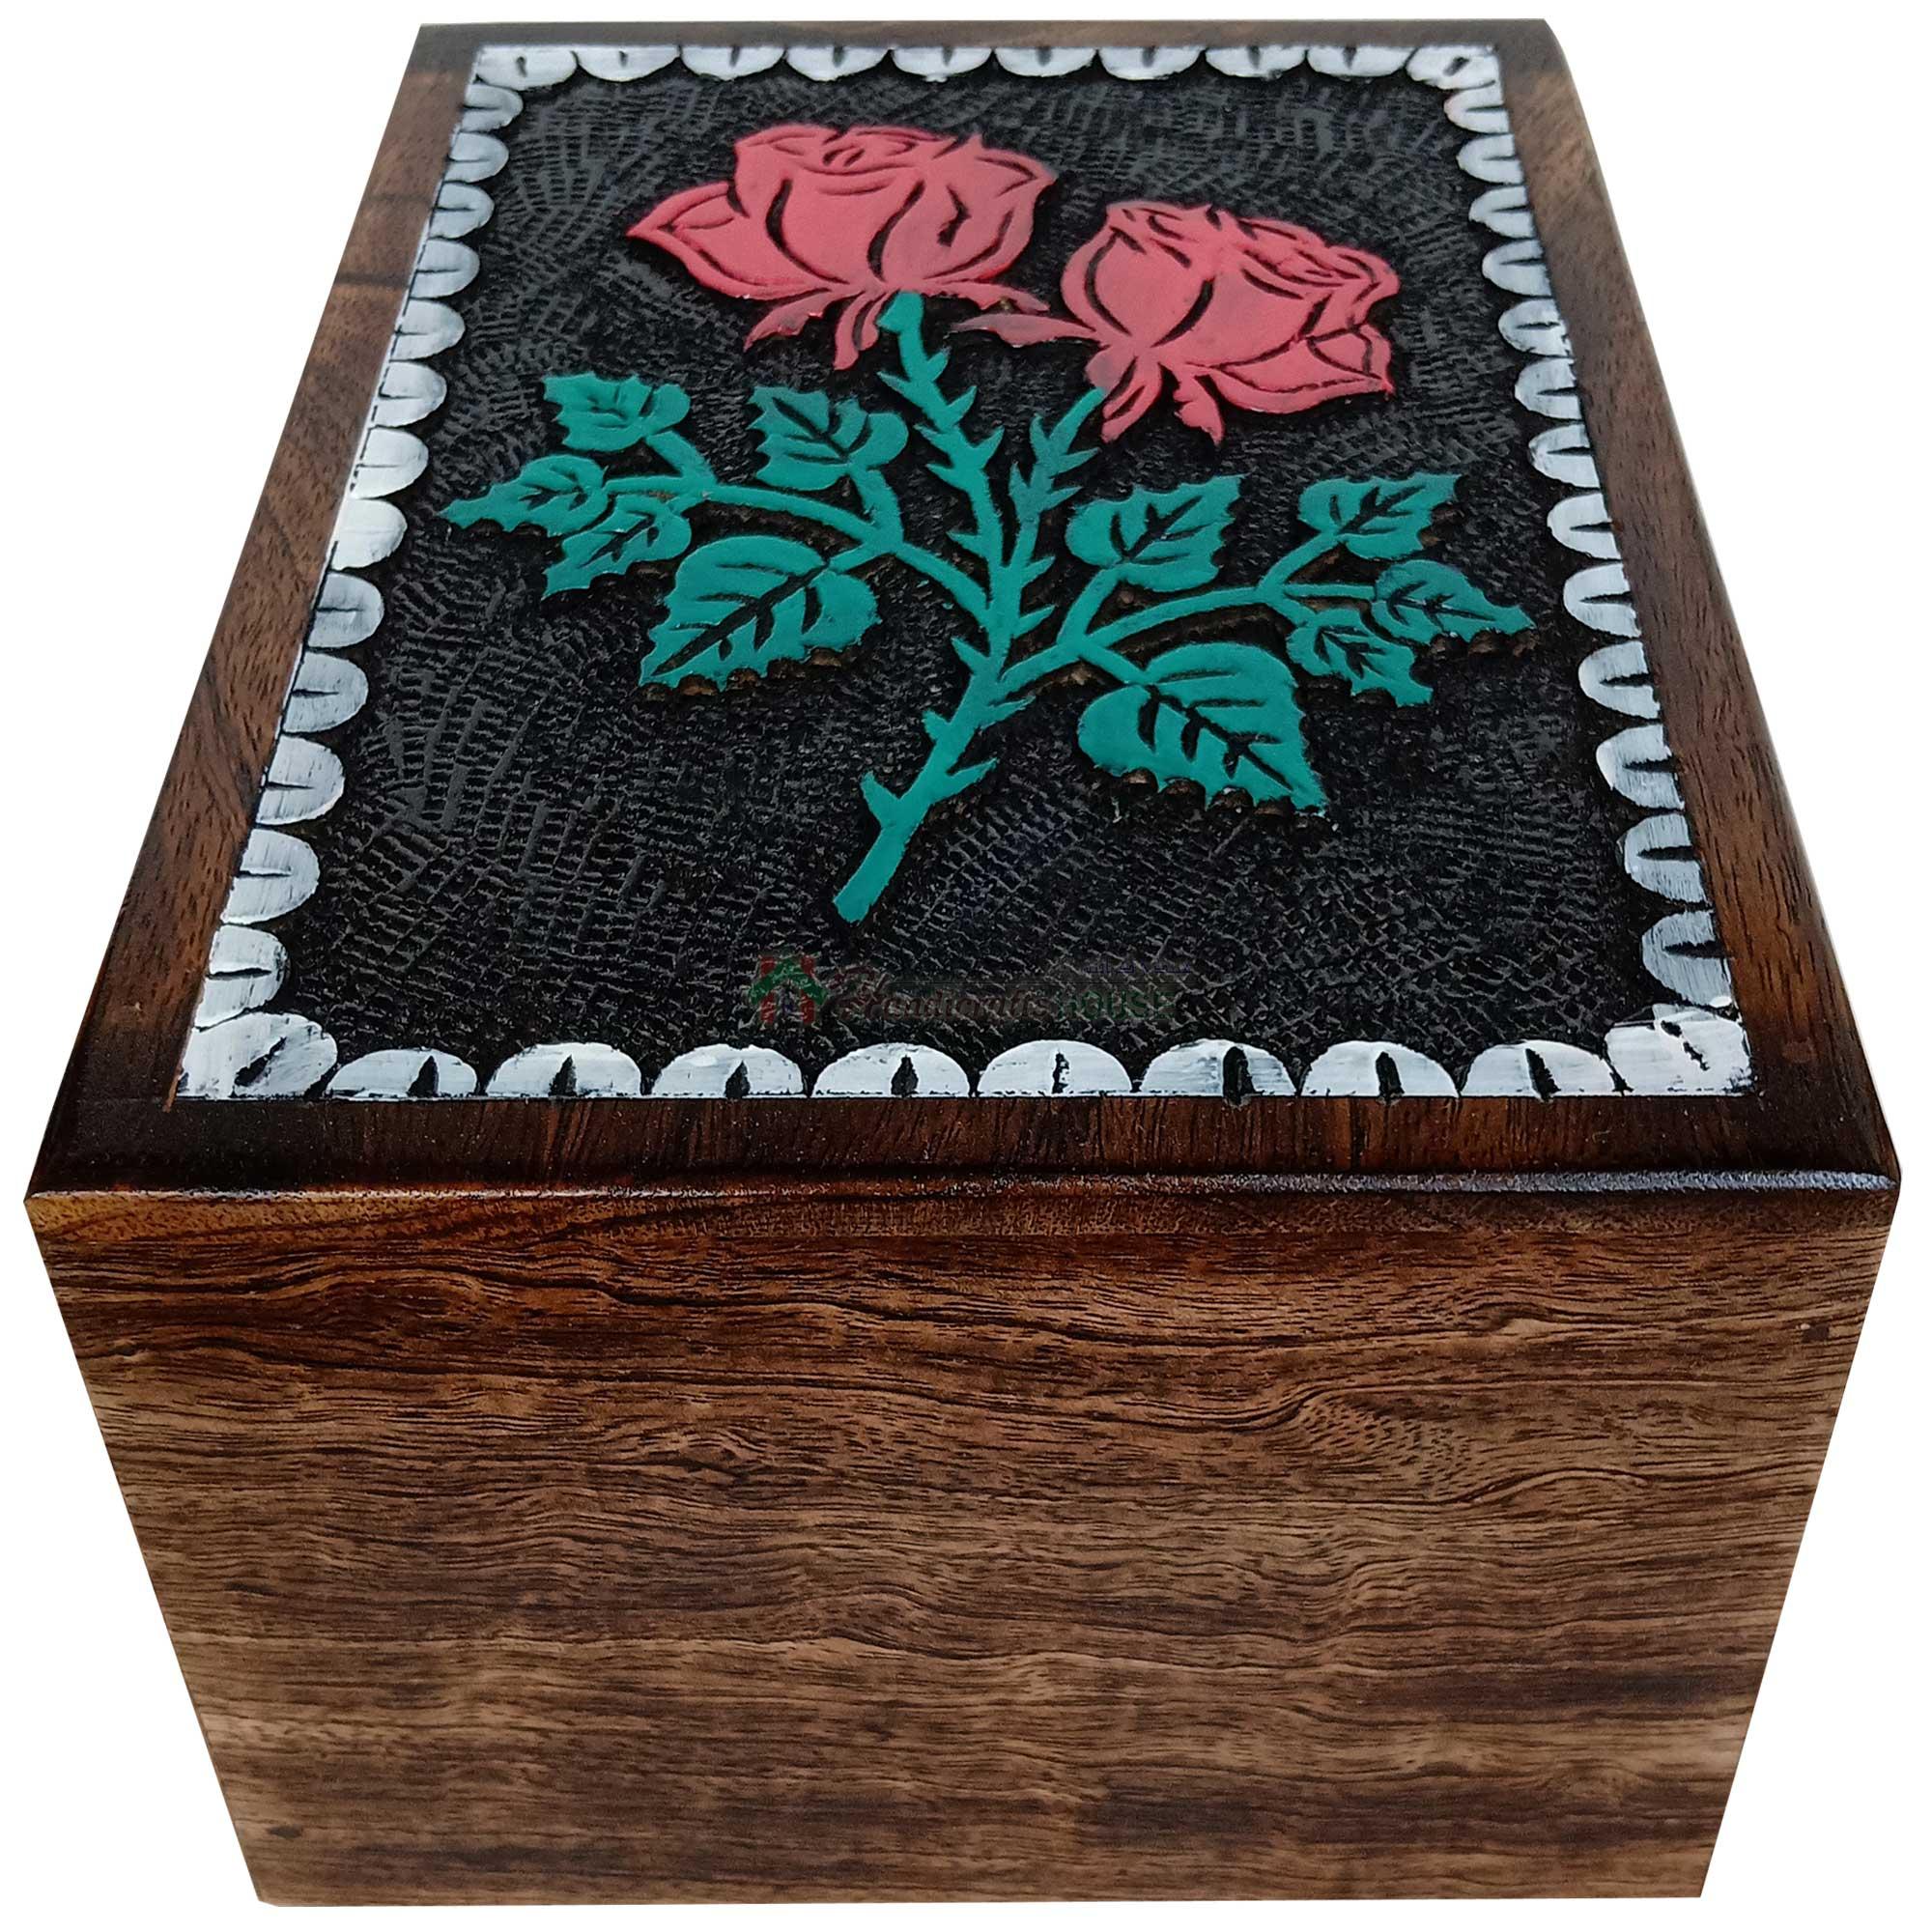 flower engraving urns